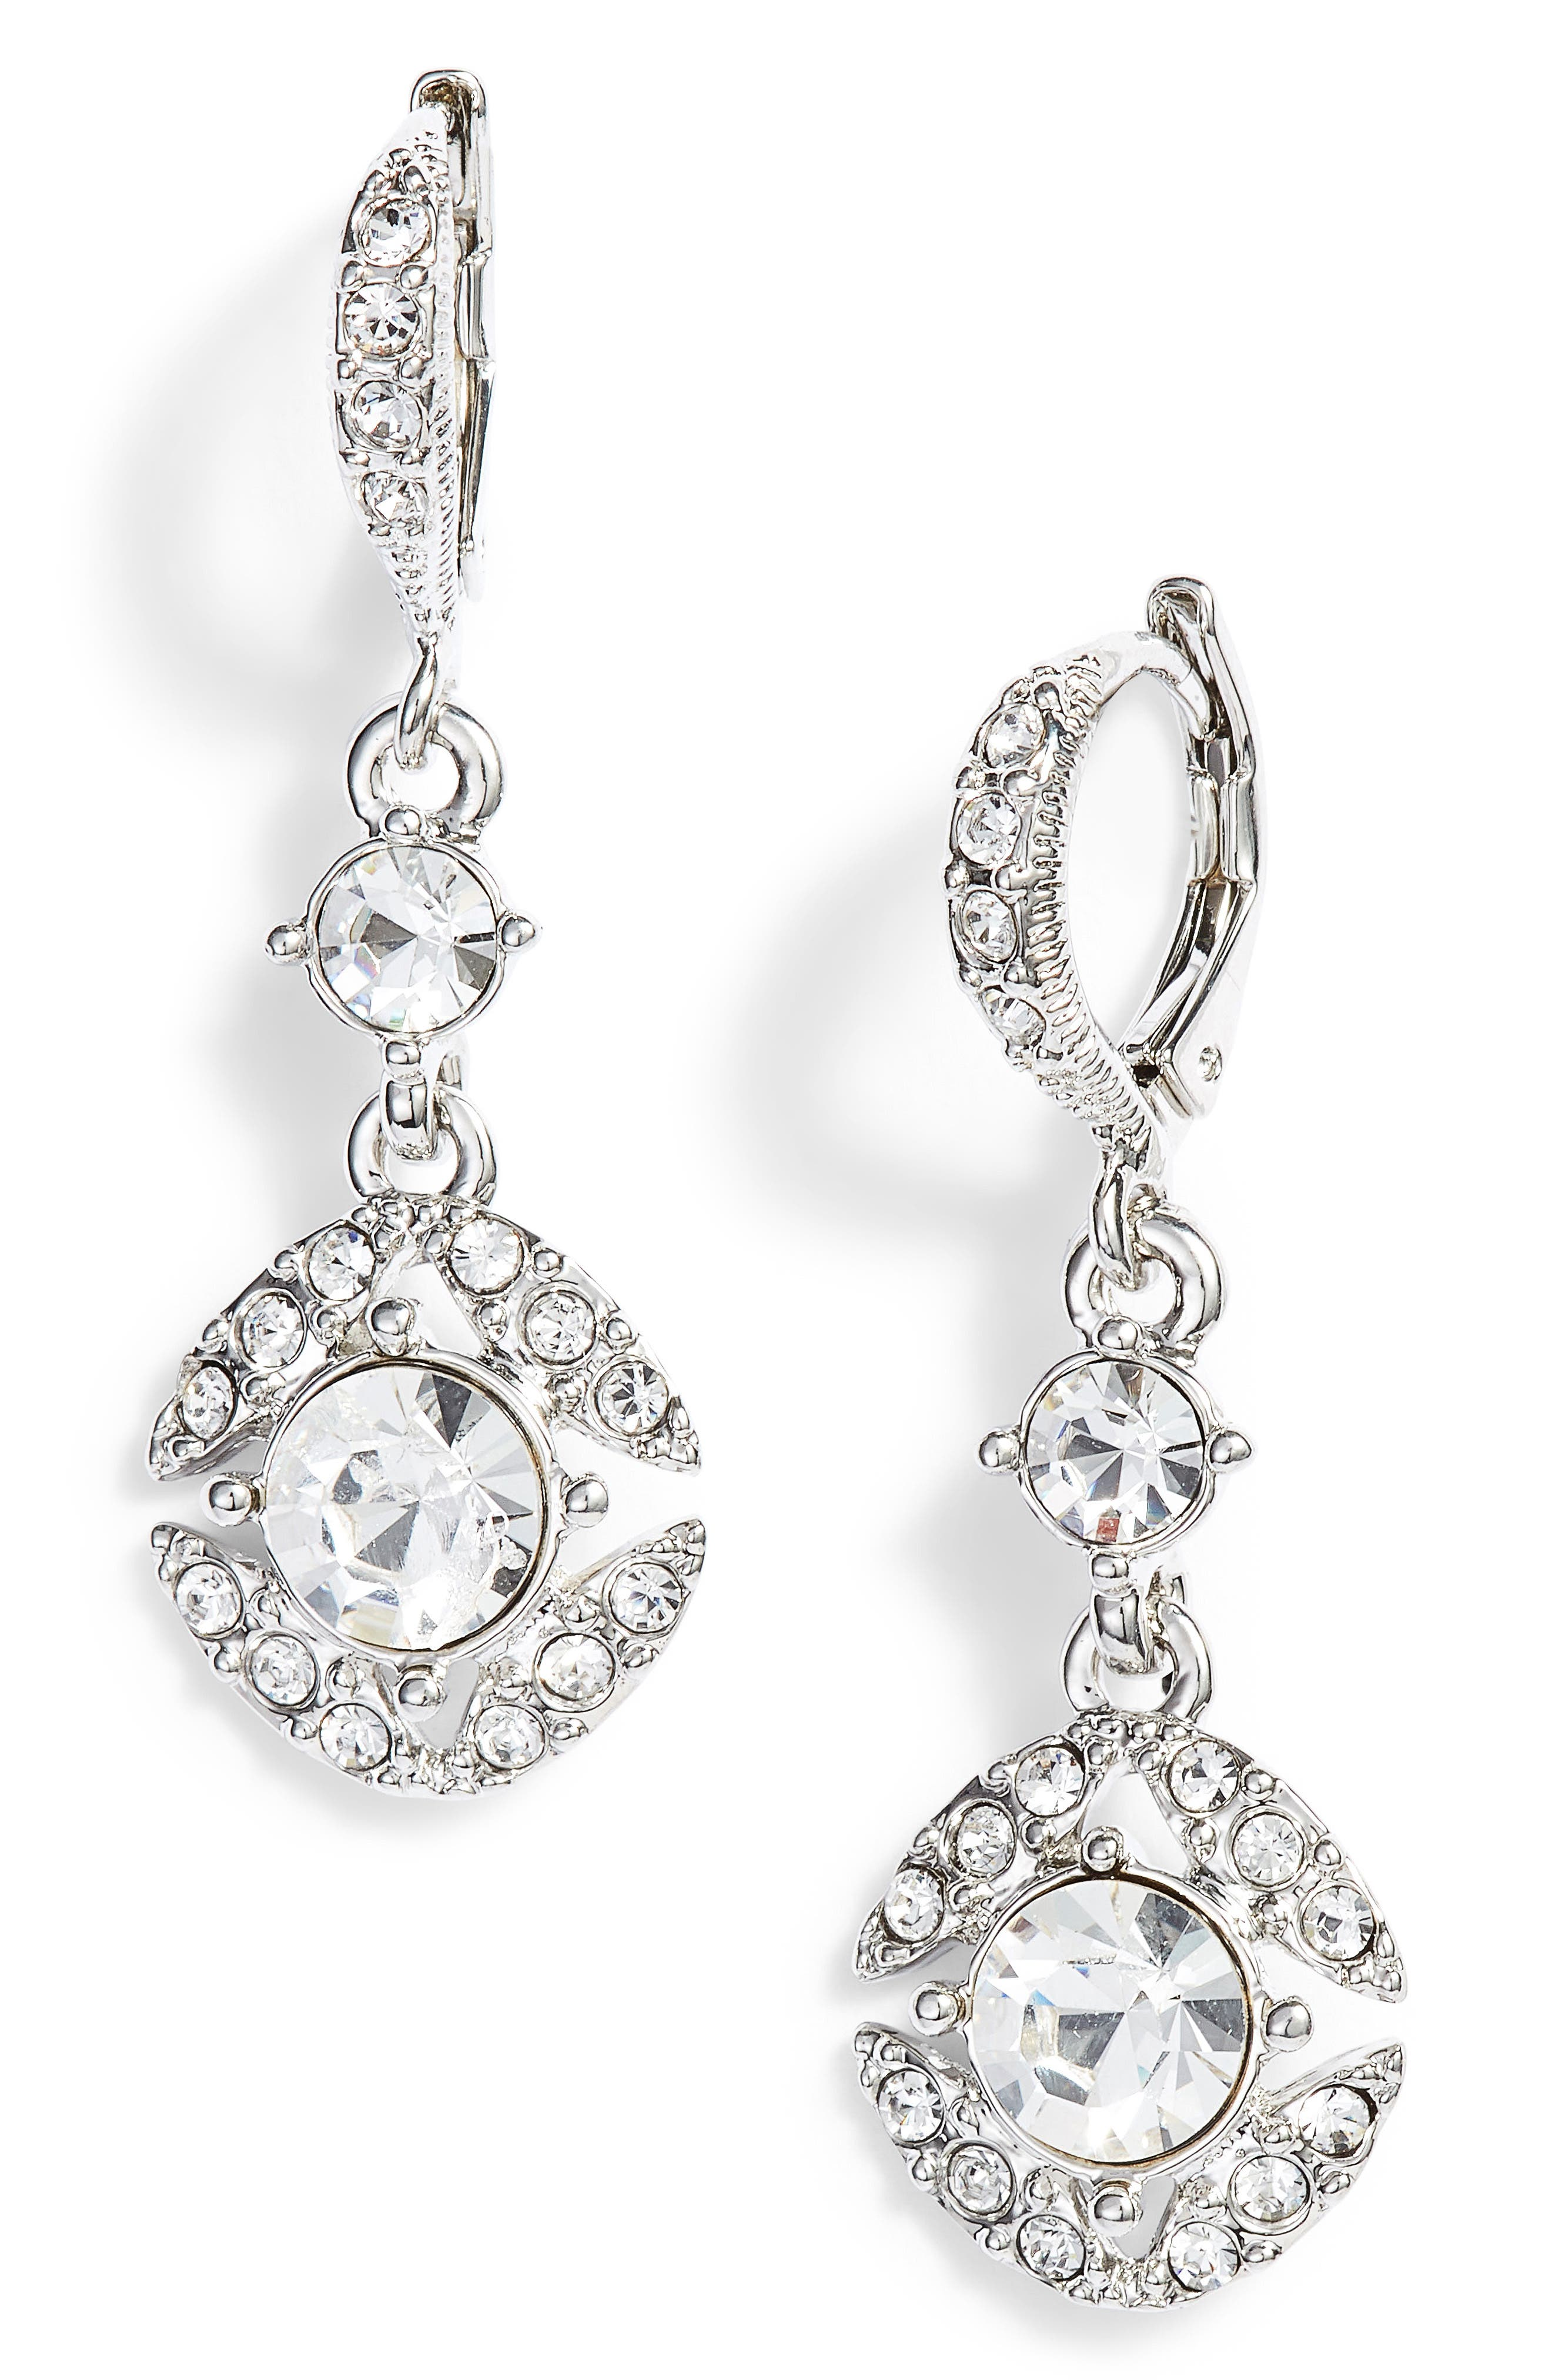 Crystal Drop Earrings,                             Main thumbnail 1, color,                             Silver/ Crystal